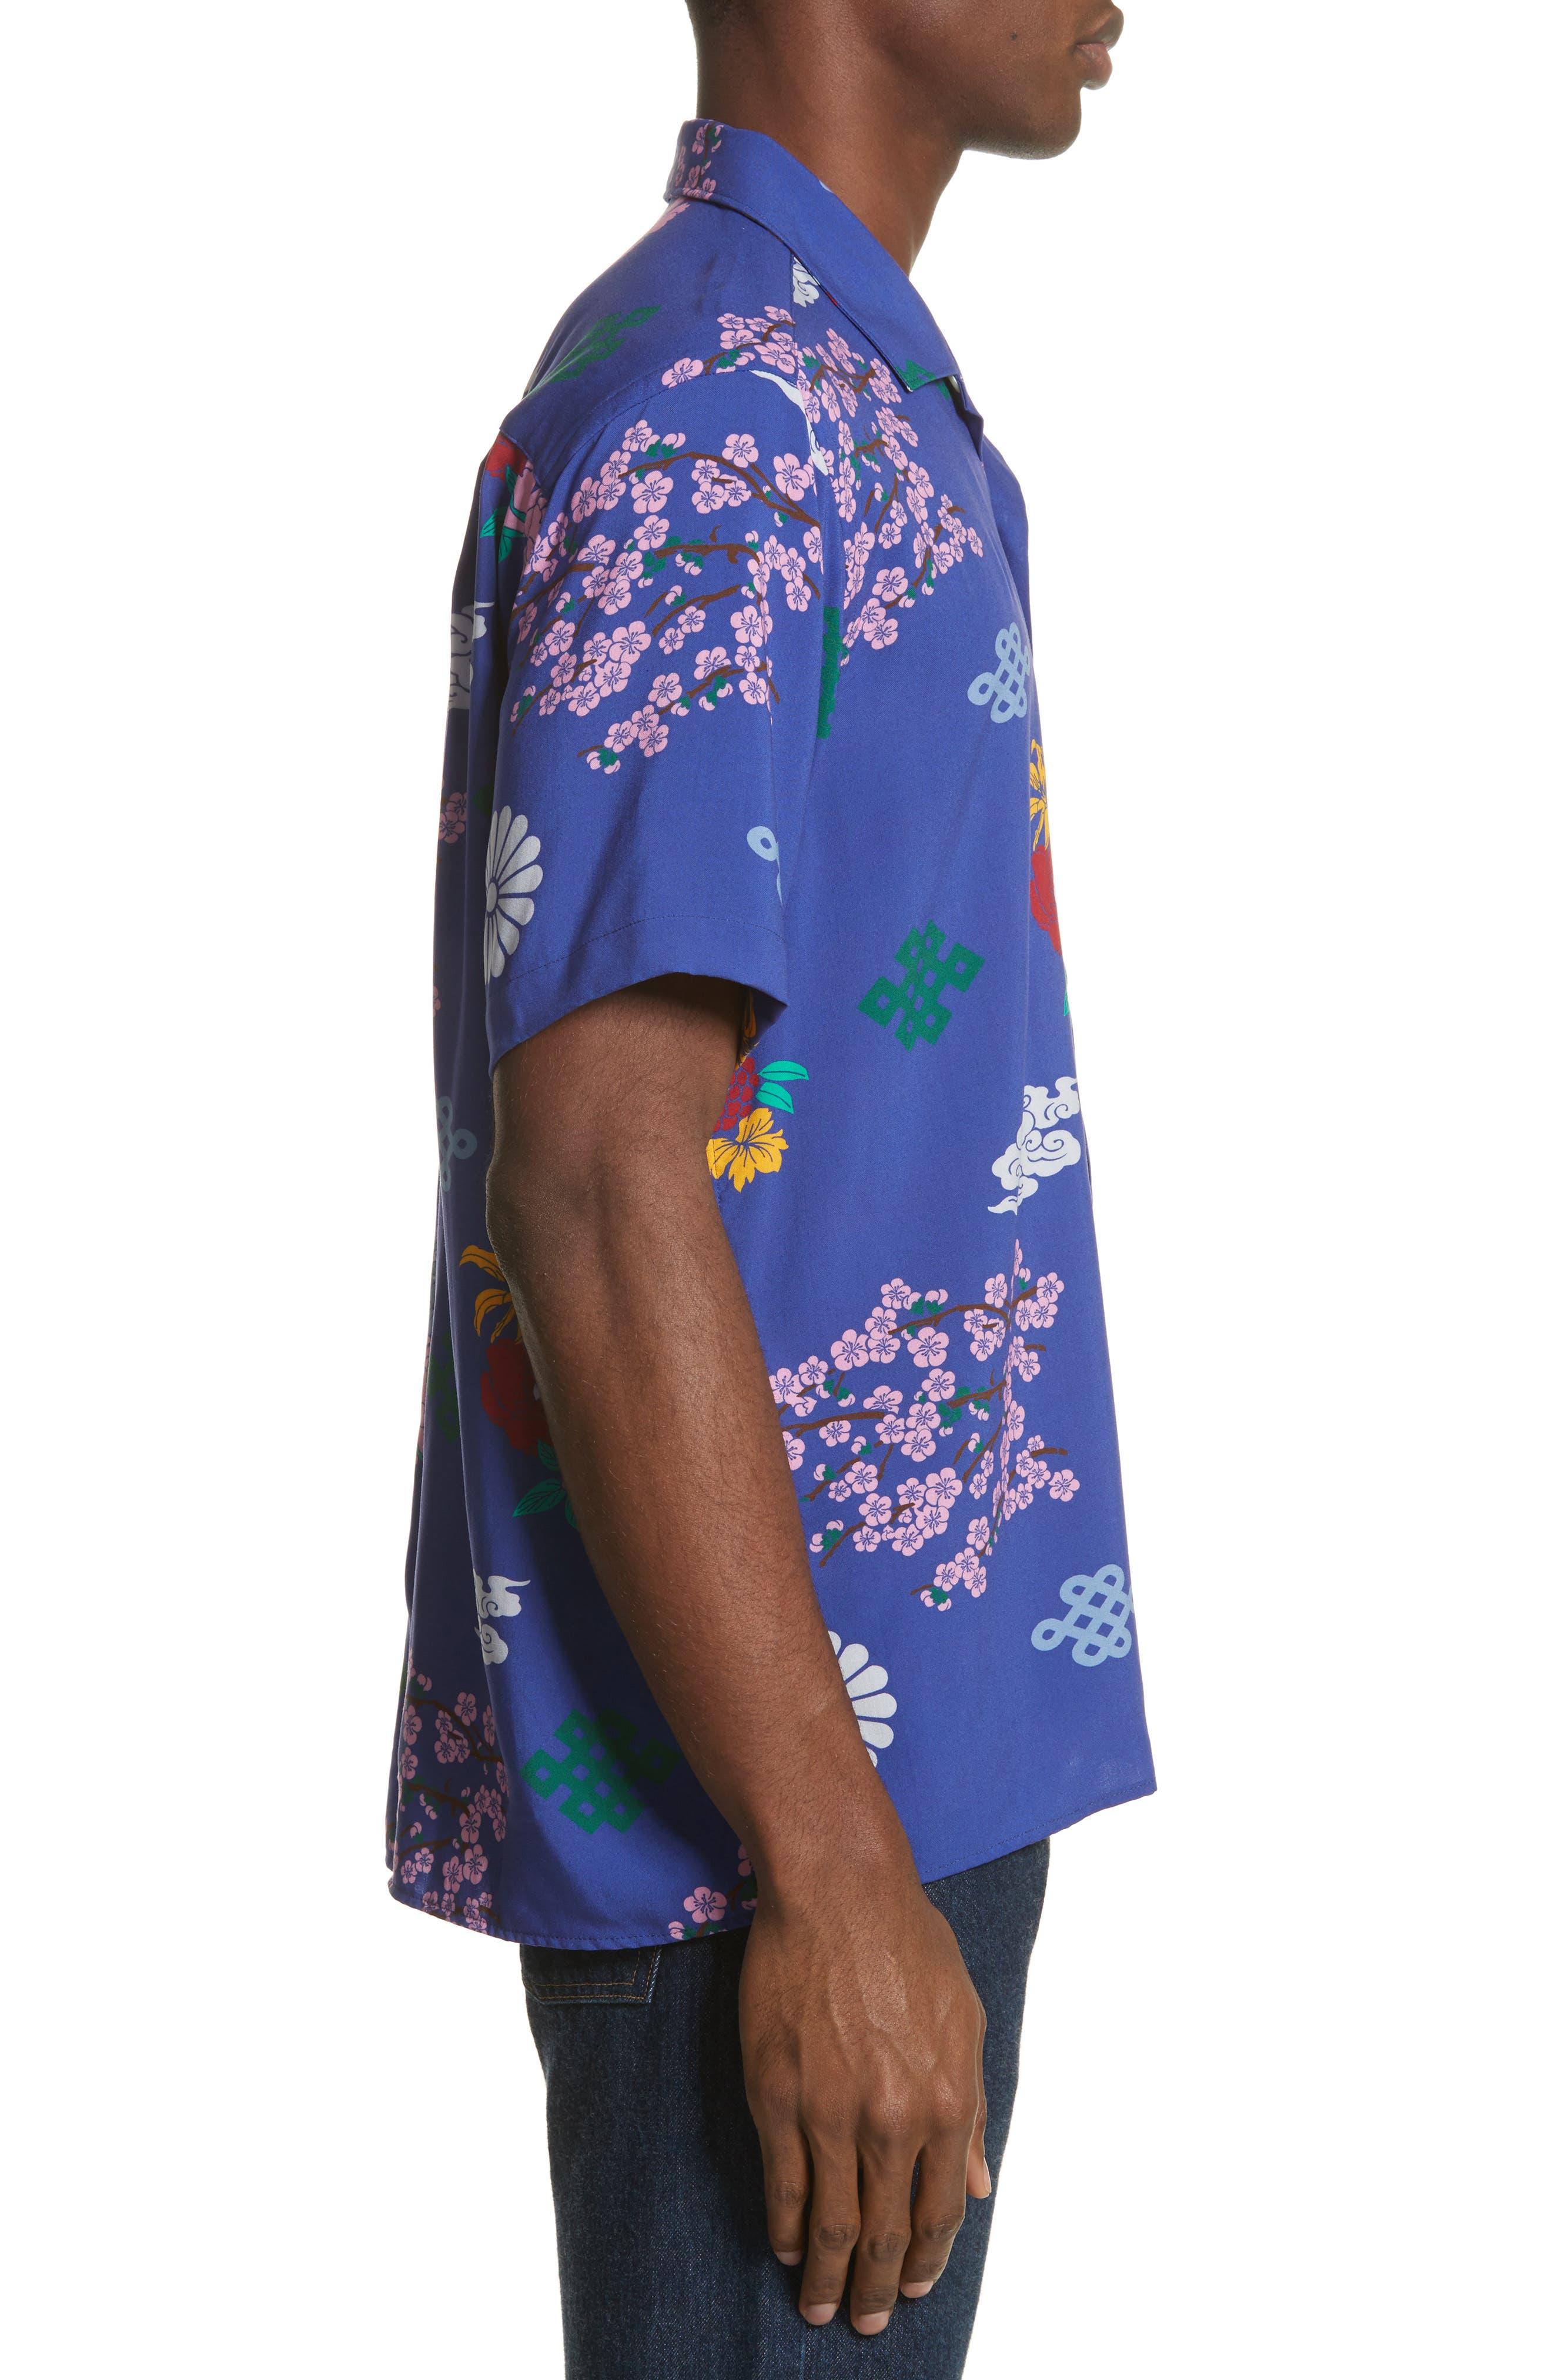 x The North Face Men's Floral Print Camp Shirt,                             Alternate thumbnail 4, color,                             400